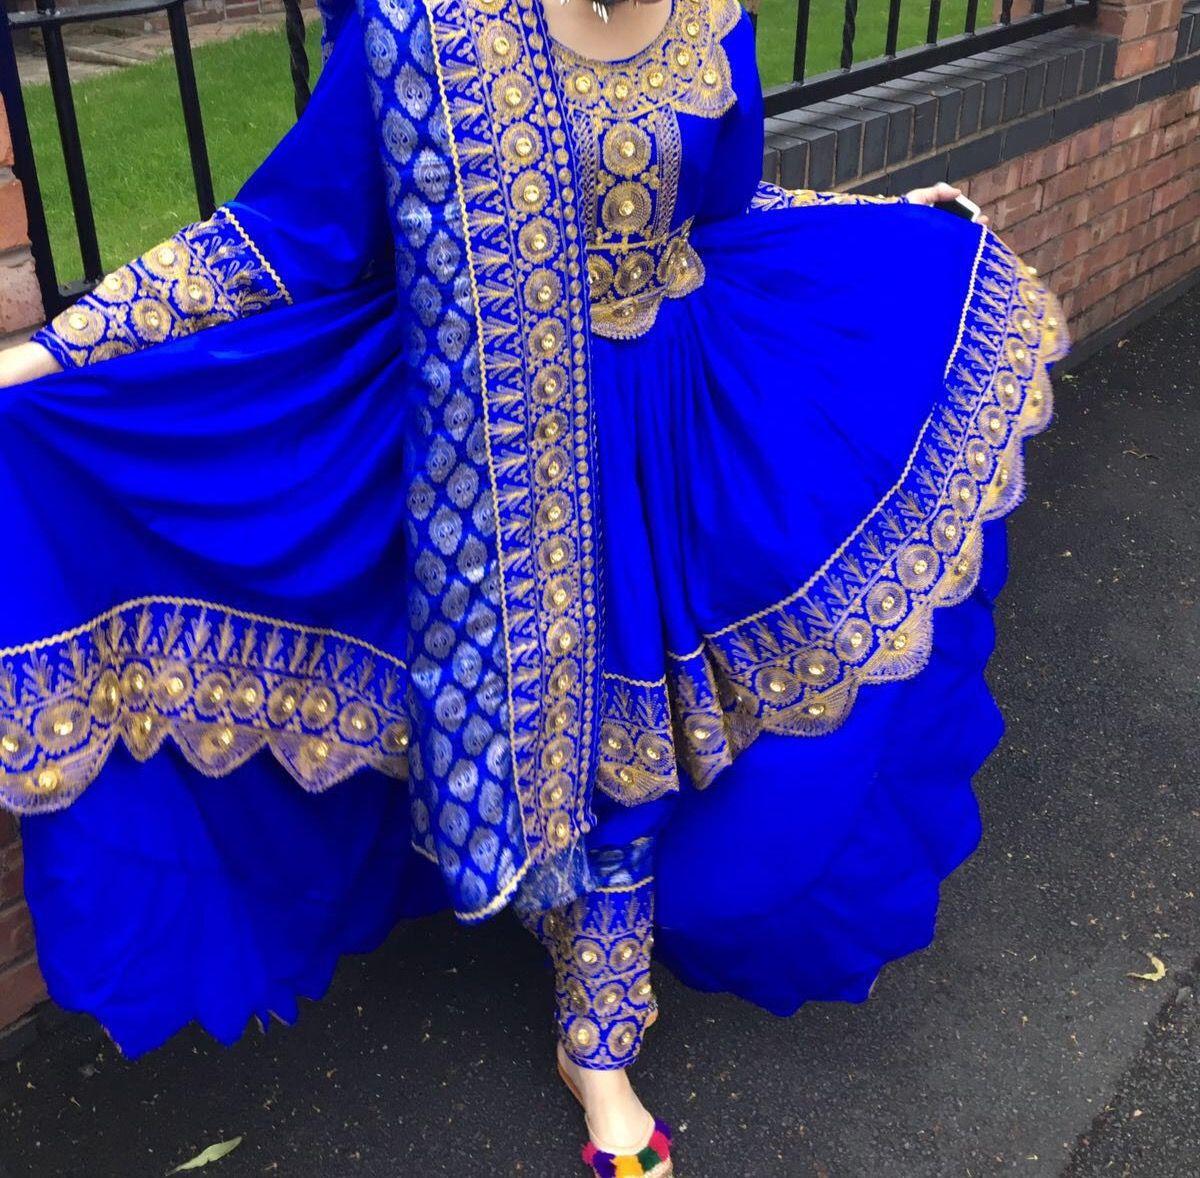 Pin von Nadia Habib auf Traditional dressing | Pinterest ...